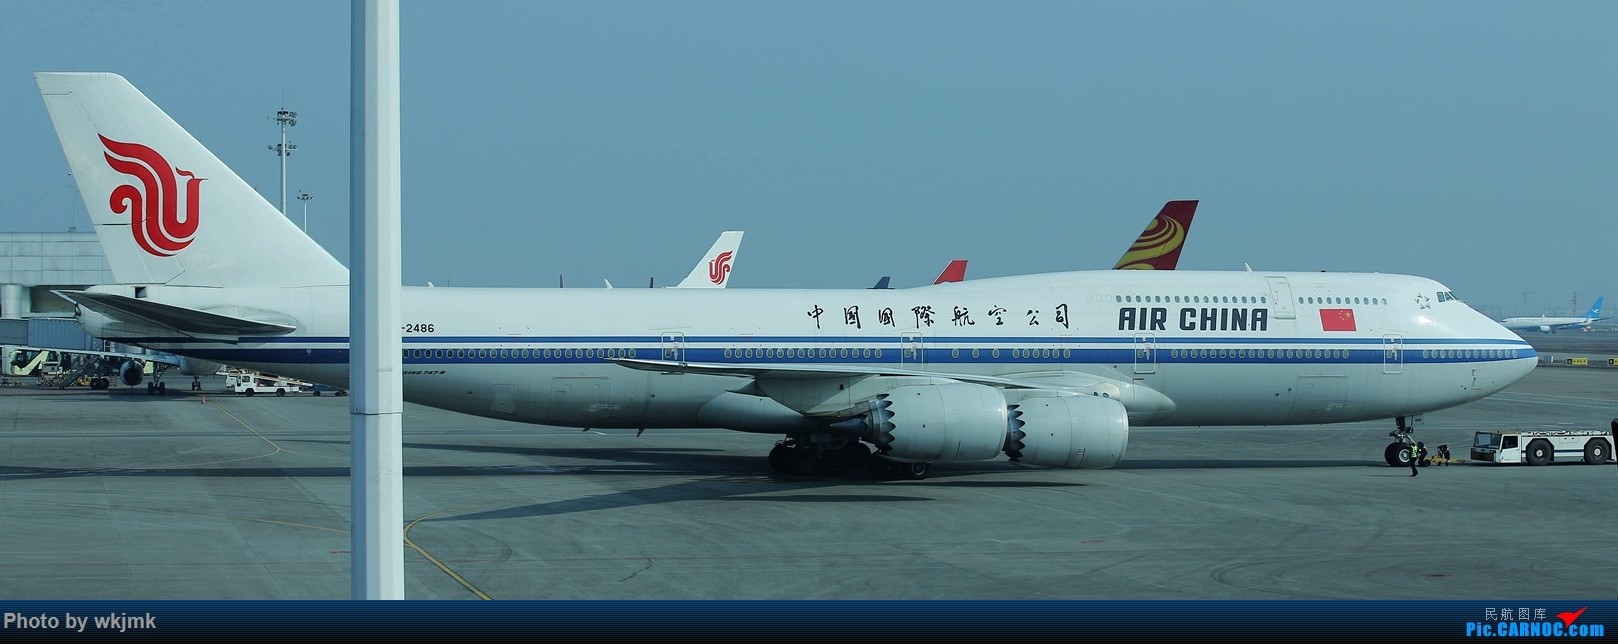 Re:[原创]广州拍即之旅 BOEING 747-8I B-2485 中国重庆江北国际机场